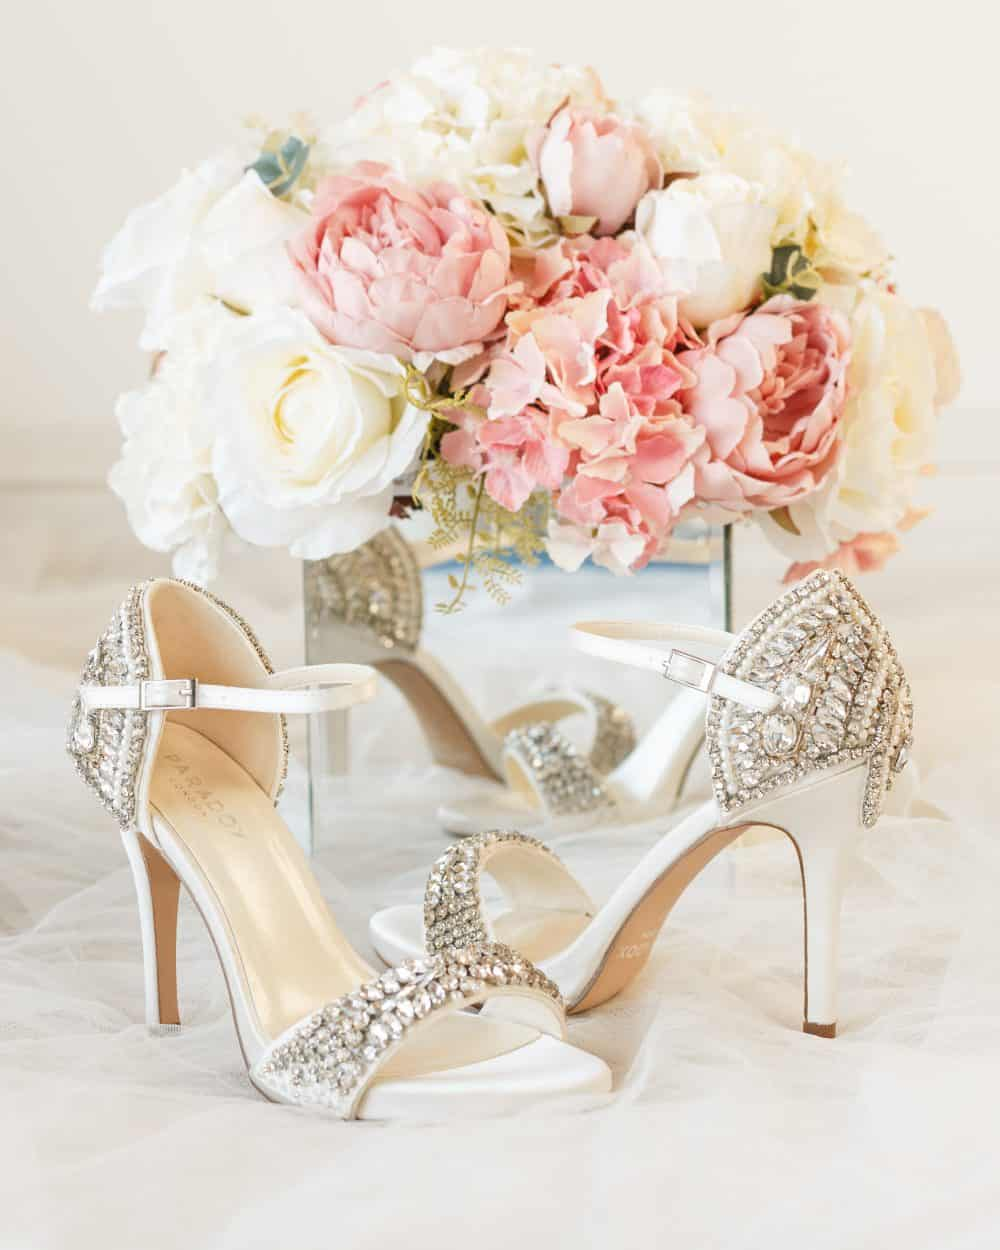 Wedding shoes - Elodie Ivory Satin High Heel Platform Sandal